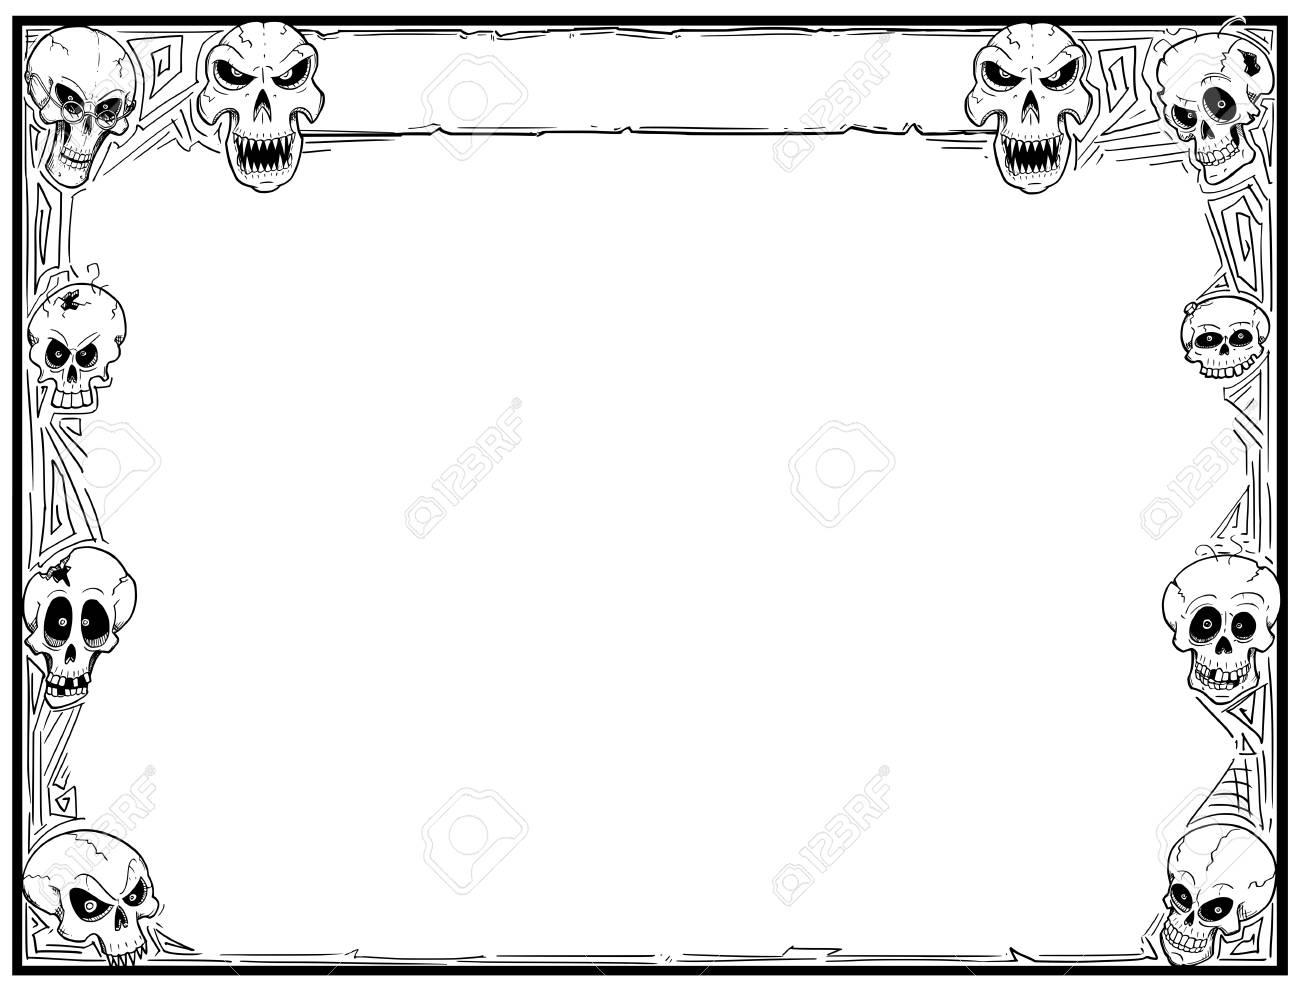 Hand Drawing Cartoon Halloween Frame With Skull Illustrations ...